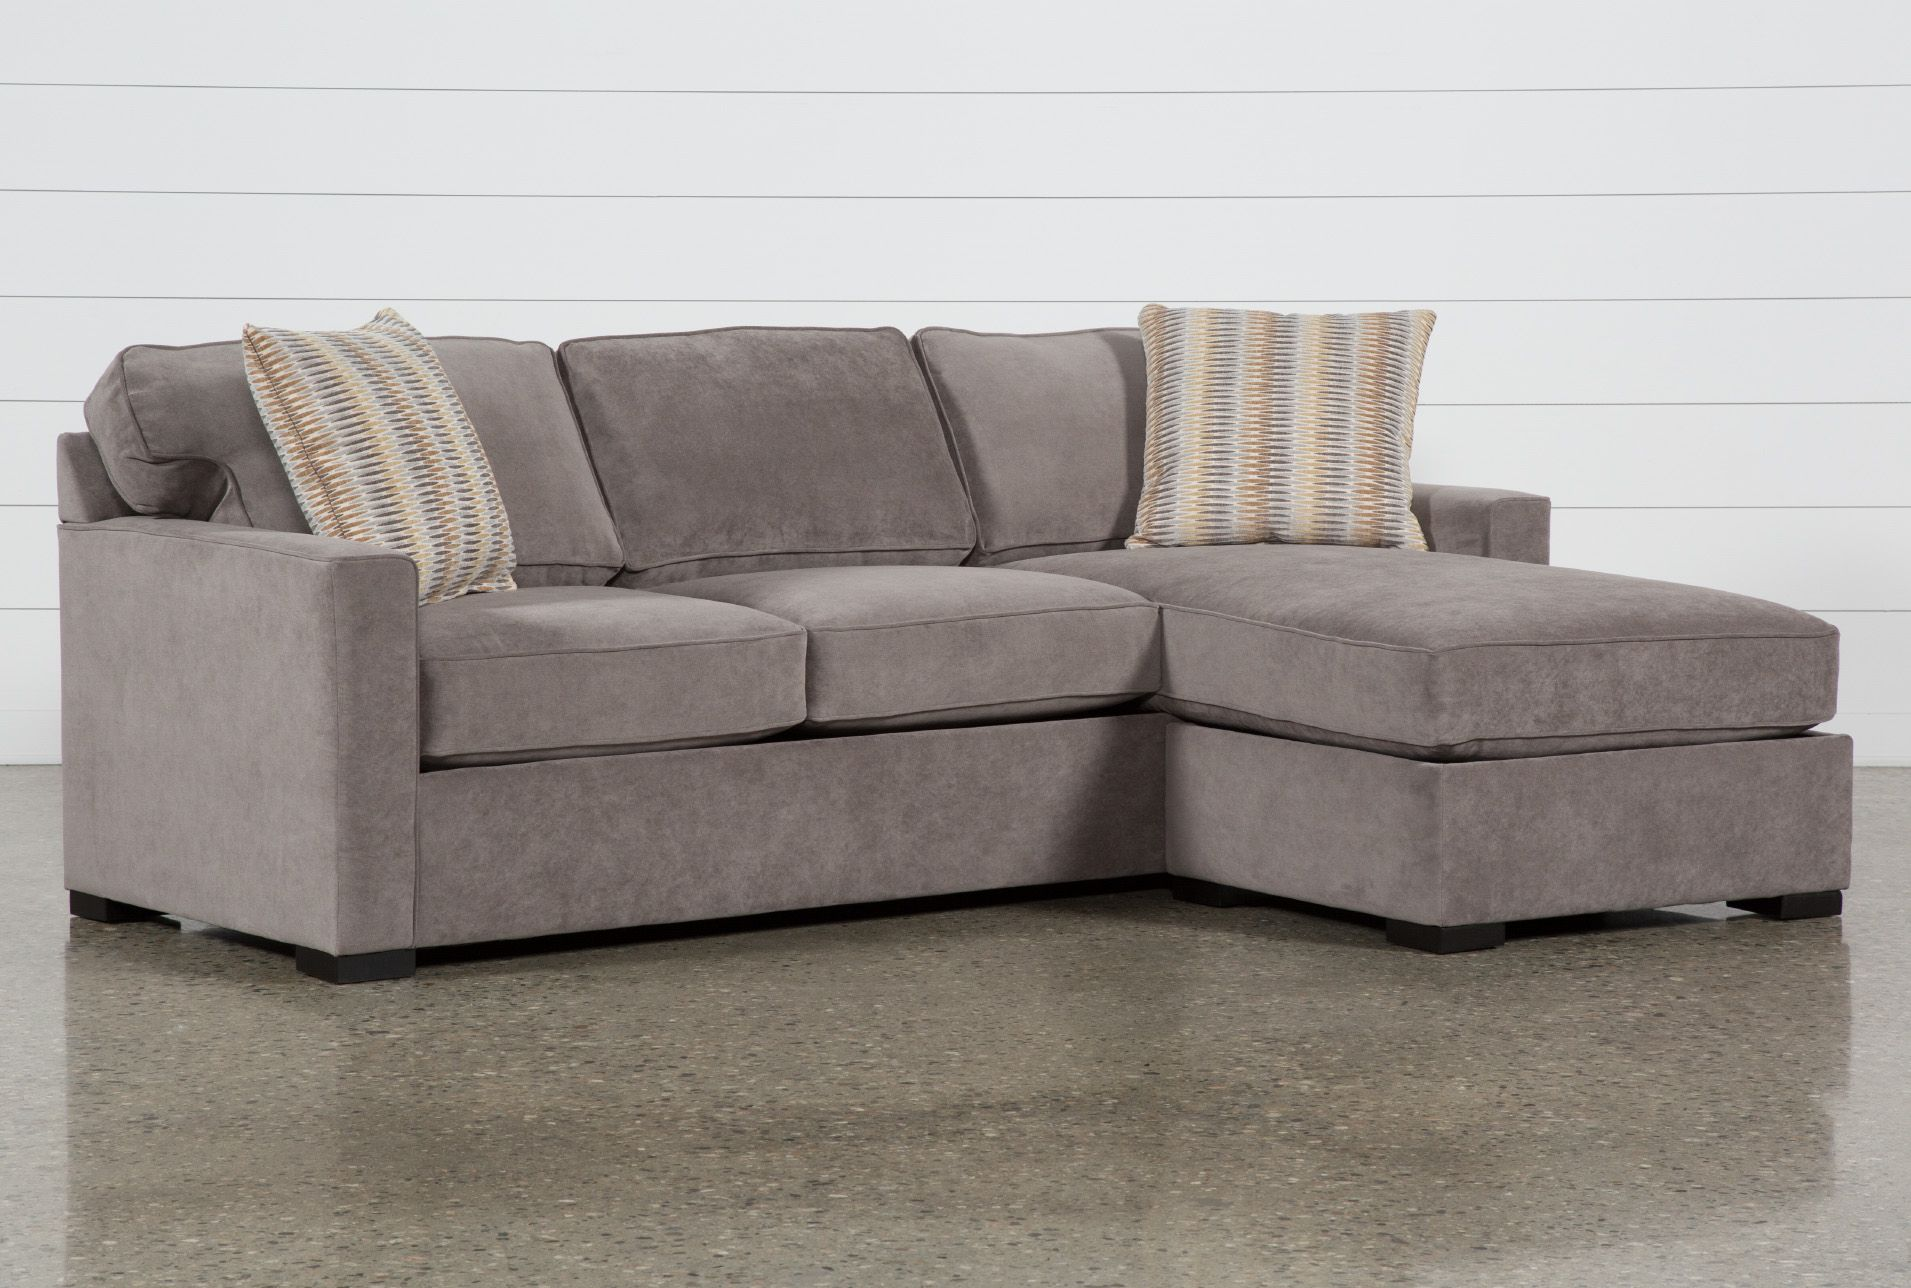 Taren Ii Reversible Sofa Chaise Sleeper With Storage Ottoman Chaise Sofa Sectional Sofa